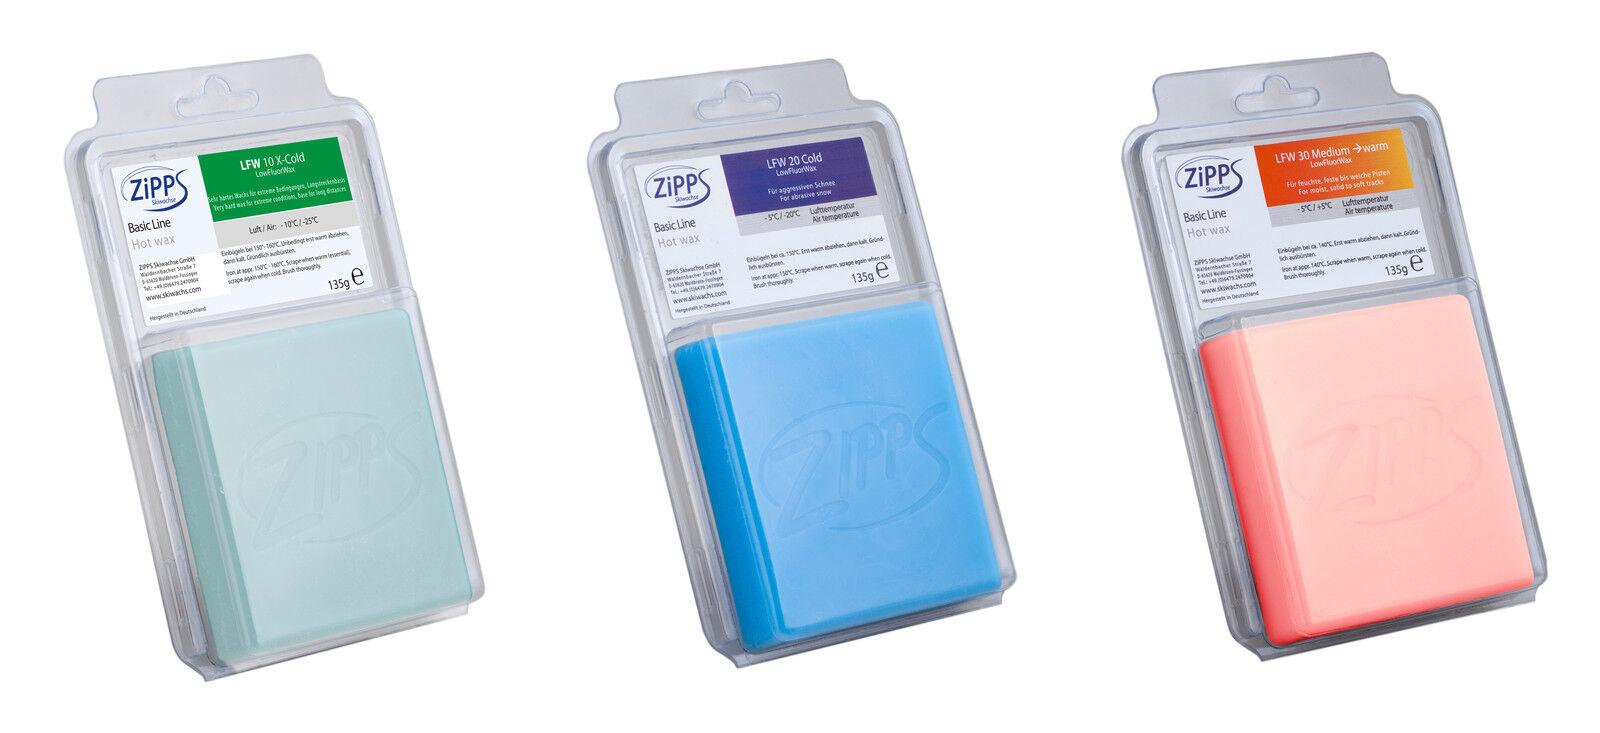 Zipps Hot Wax Race Wax Low Fluor Various Areas in Set